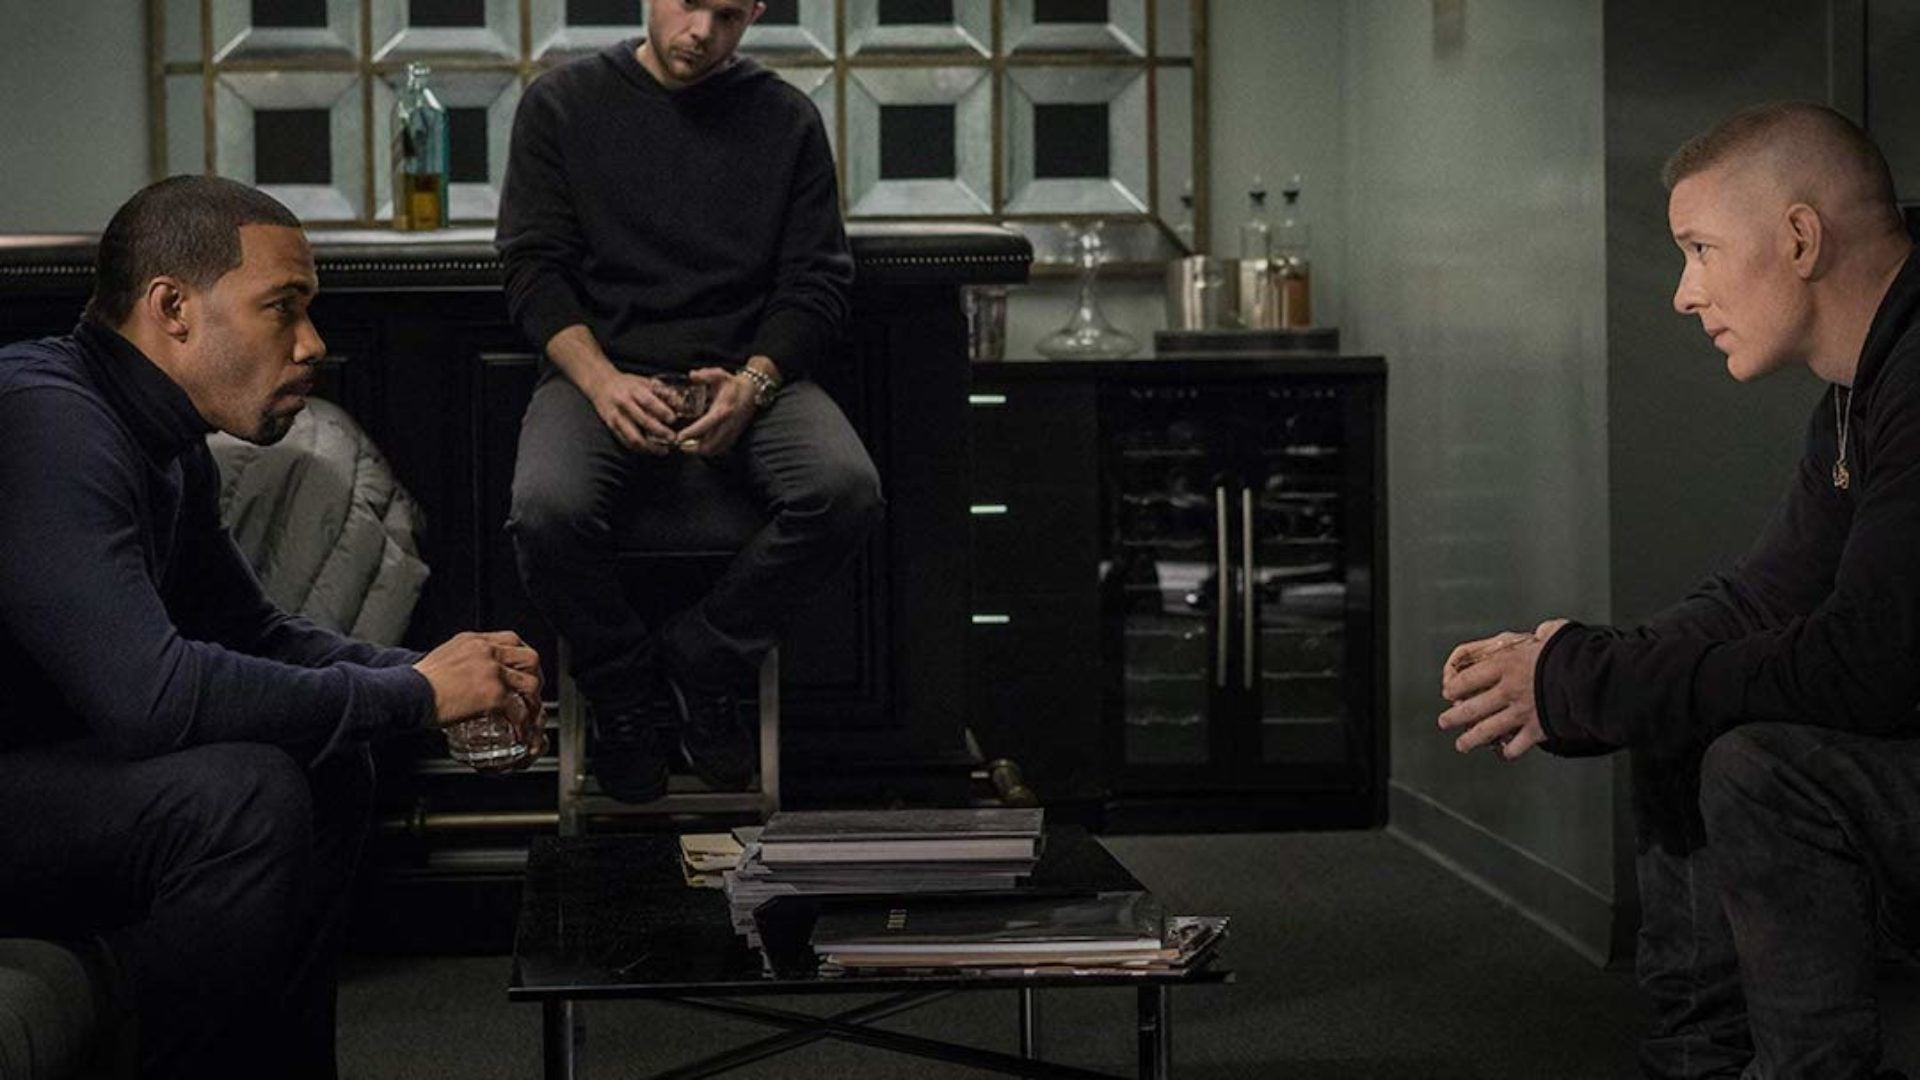 'Power' Drops New Trailer